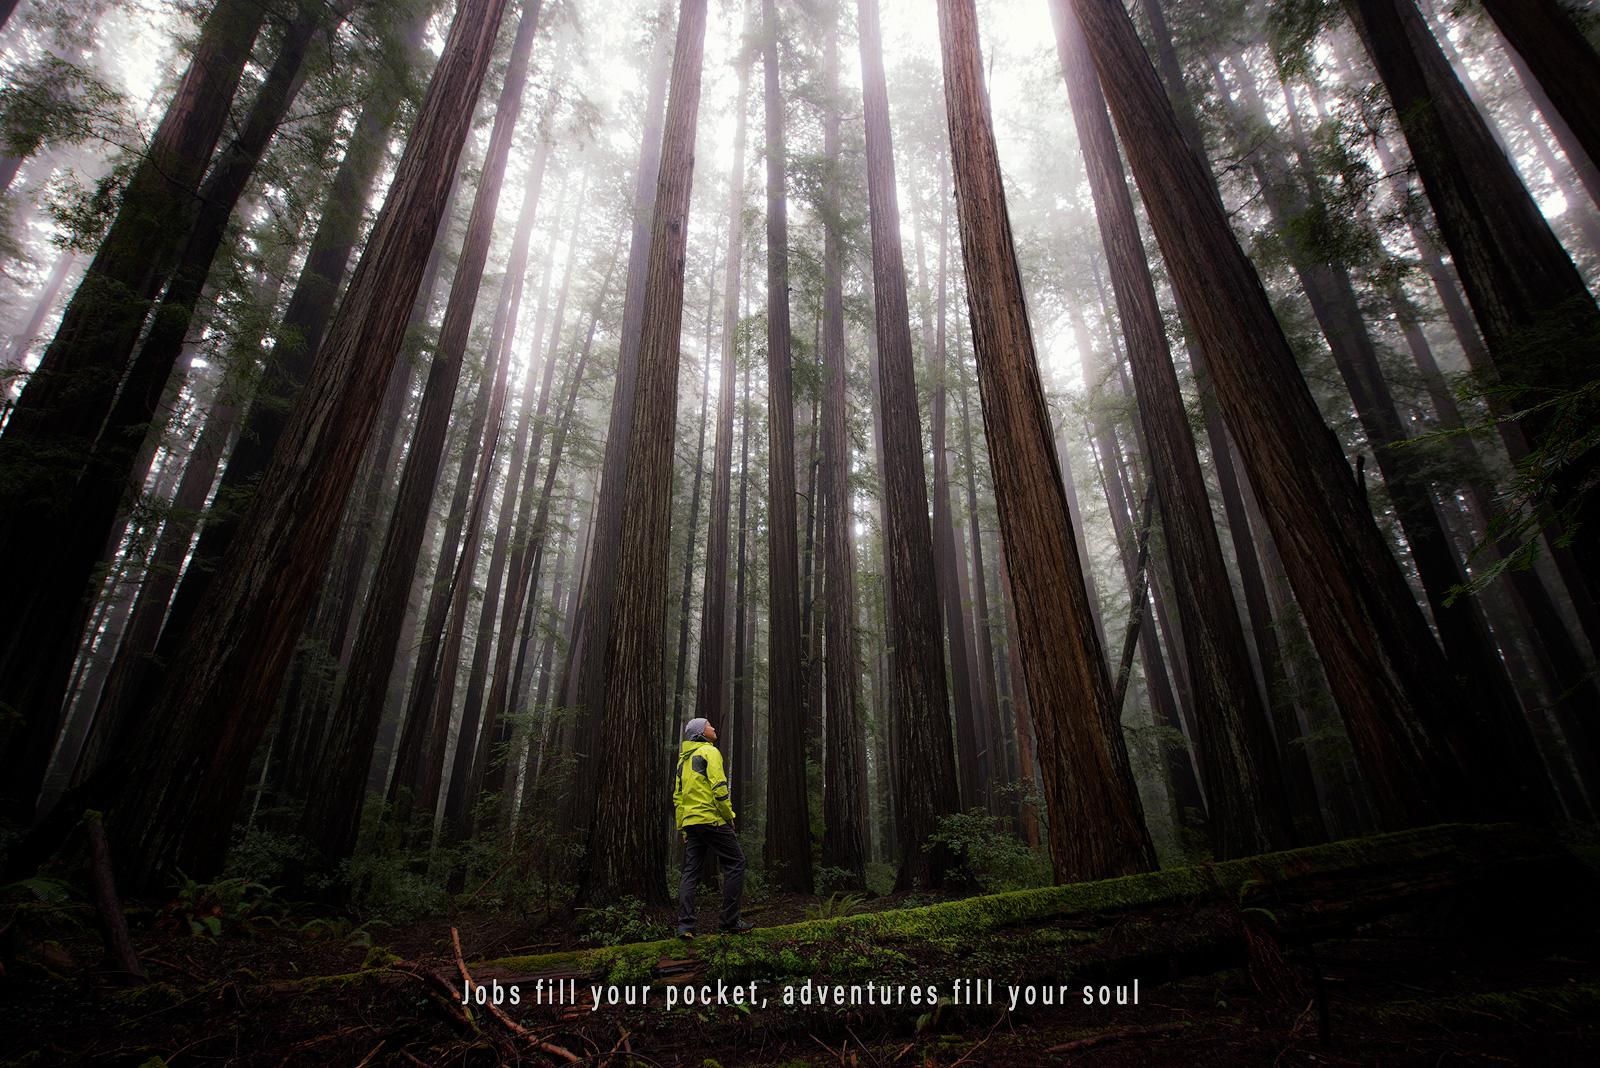 Humboldt Redwoods State Park, California, Giant Redwoods, Redwoods, Trees, Amazing Trees, Oldest Trees, Bernard Chen, photo